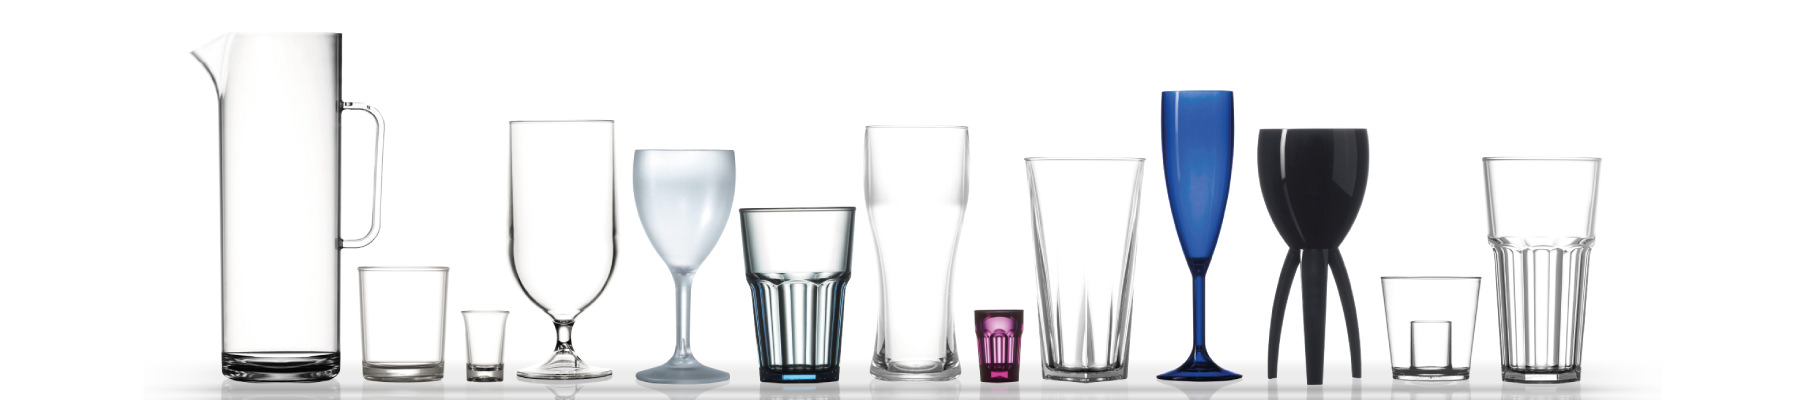 Unbreakable-Plastic-Glasses-Hampshire